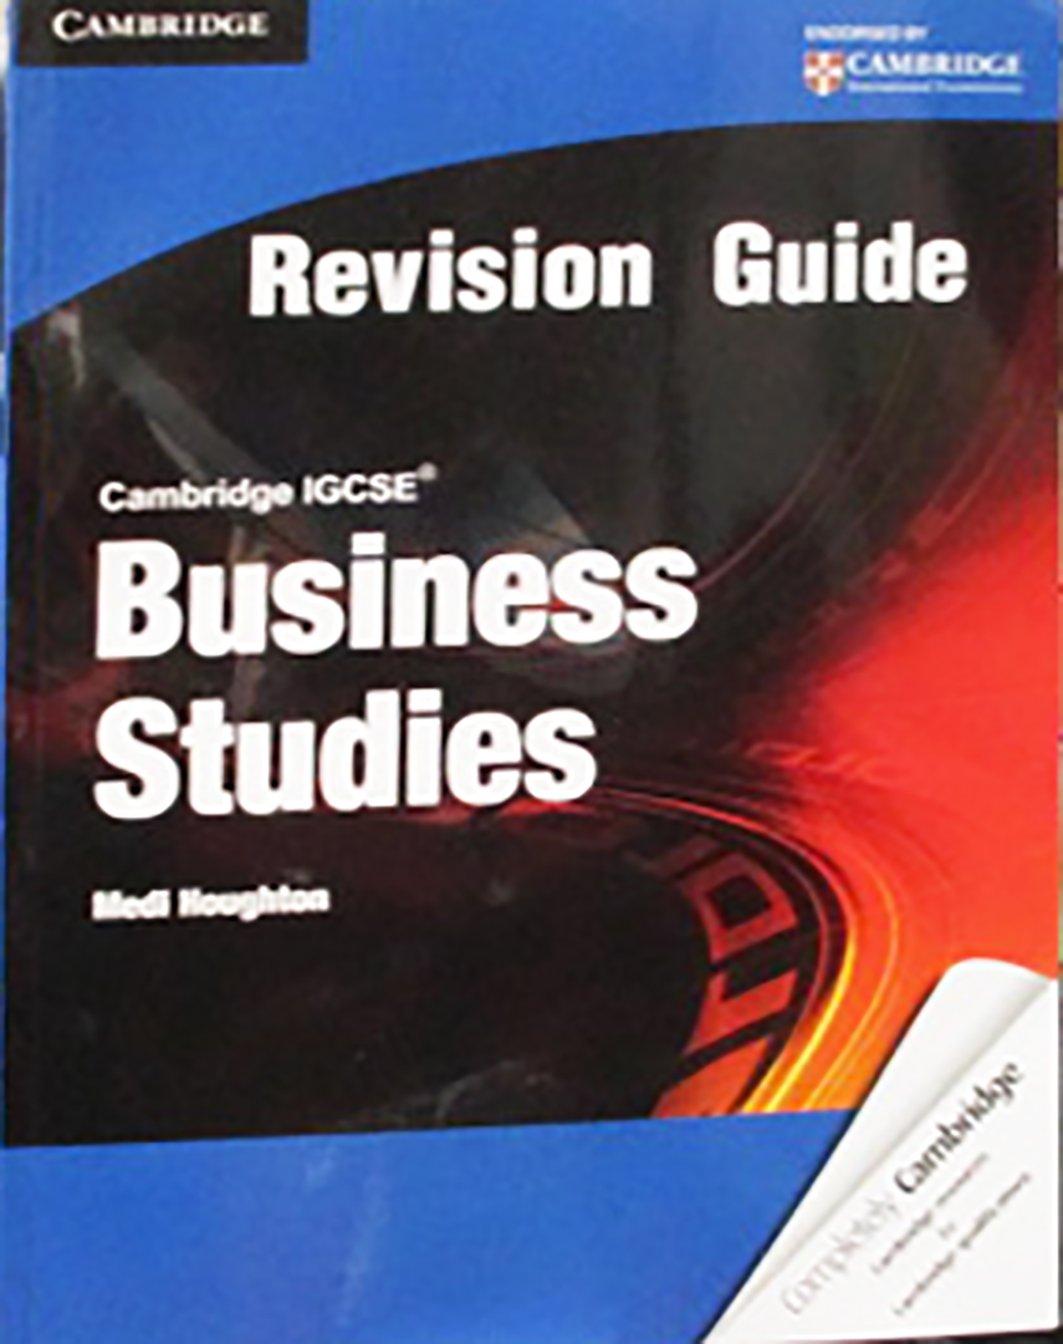 Cambridge IGCSE Business Studies Revision Guide Cambridge ...